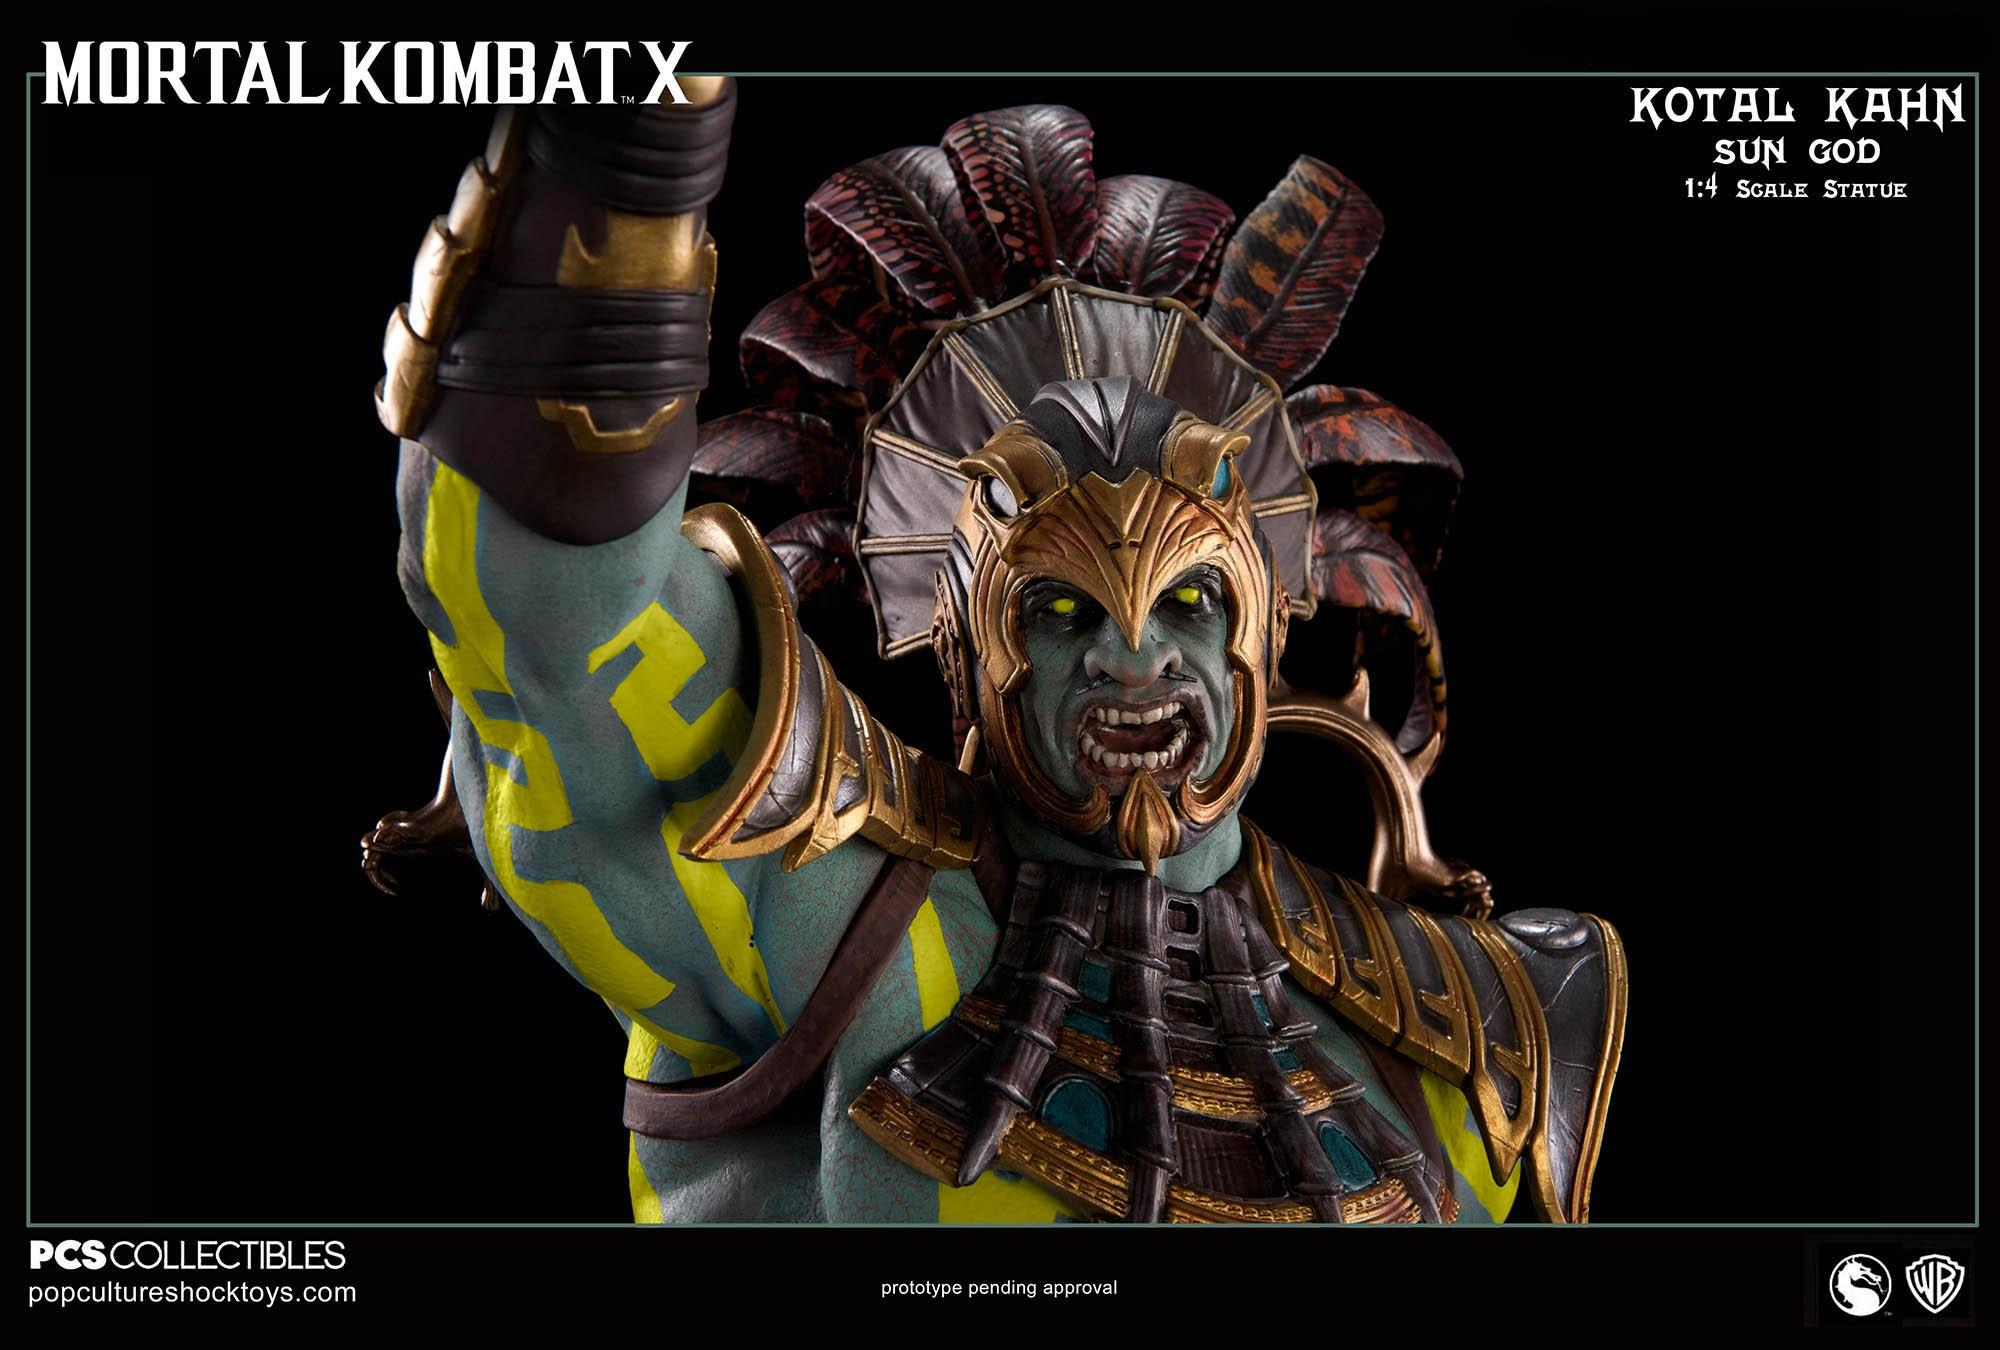 [Pop Culture Shock] Mortal Kombat X: Kotal Kahn 1:4 scale PCS-Kotal-Kahn-Sun-God-022